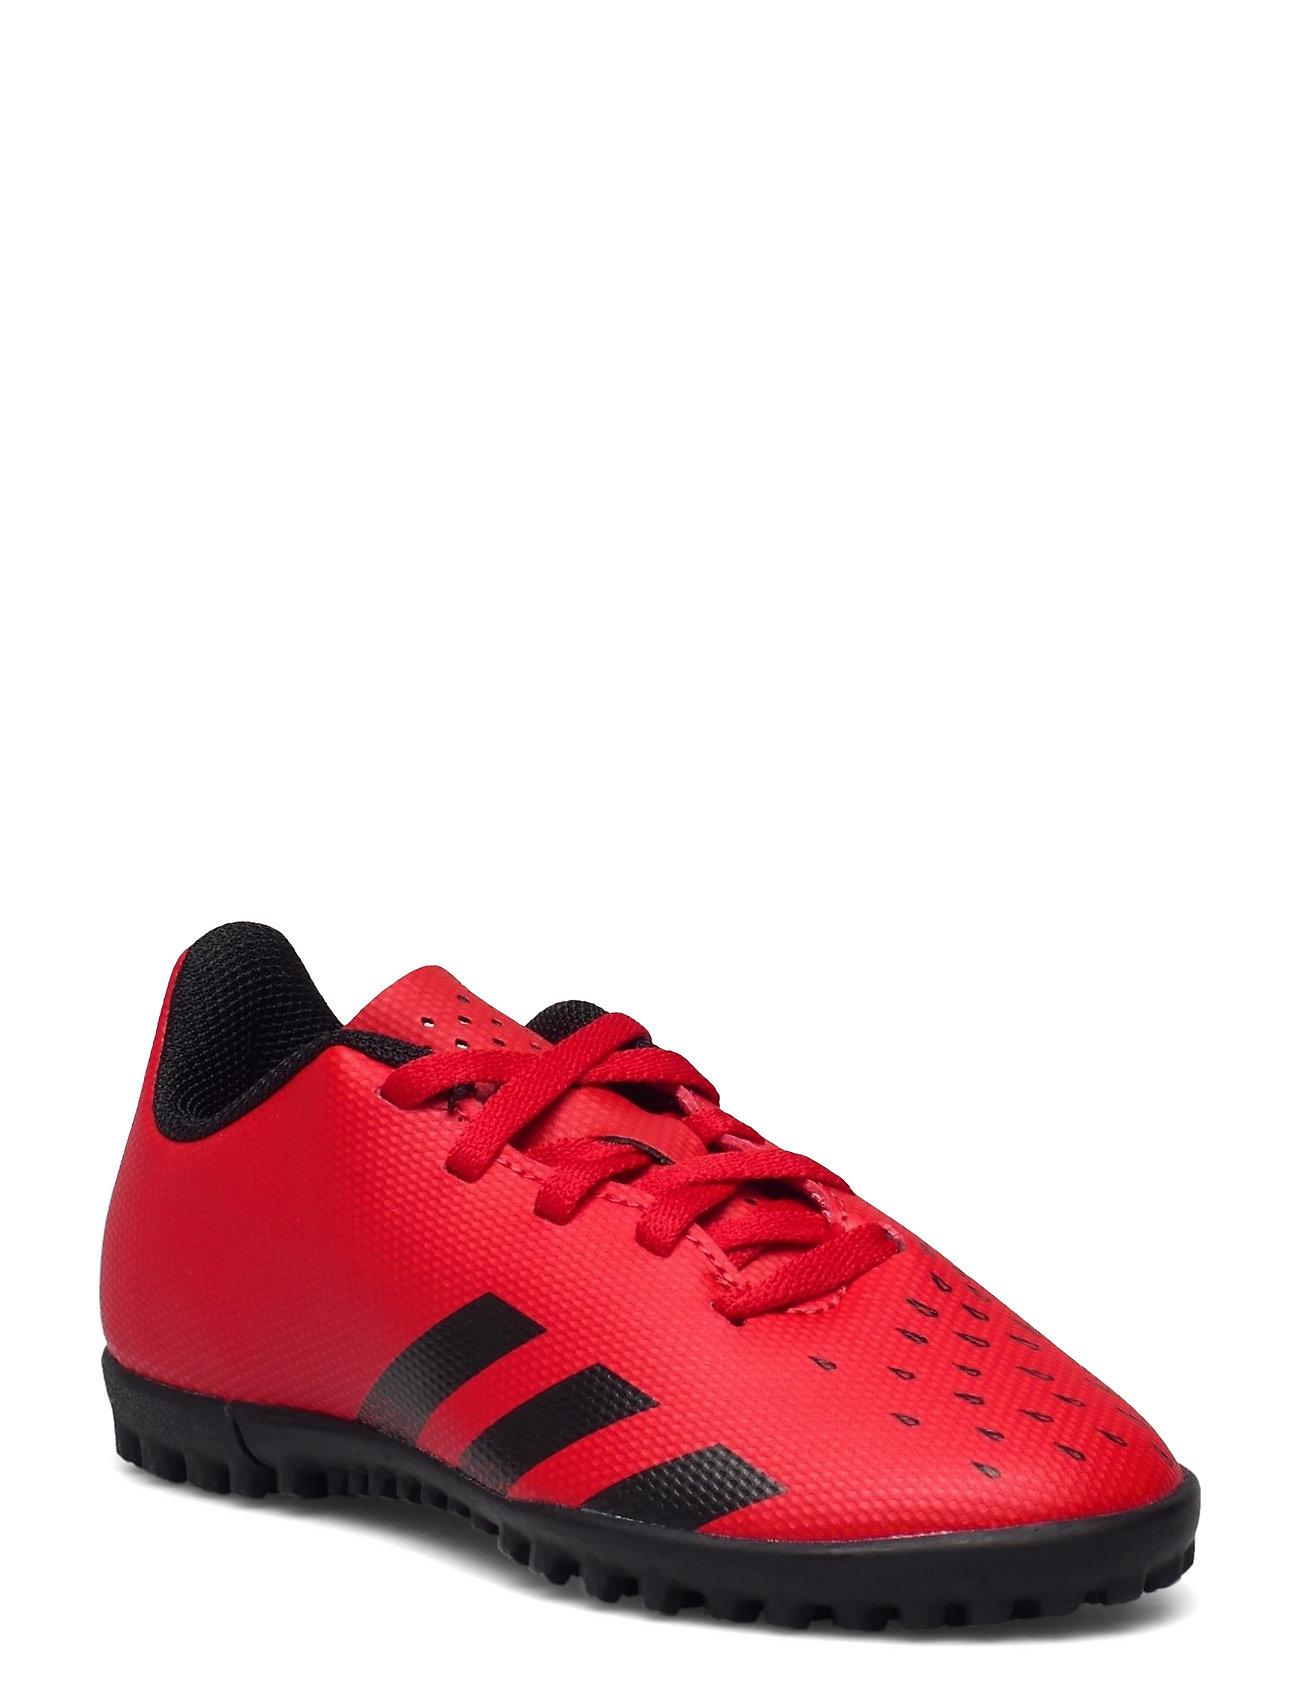 Predator Freak.4 Turf Boots Q3q4 21 Shoes Sports Shoes Football Boots Rød Adidas Performance